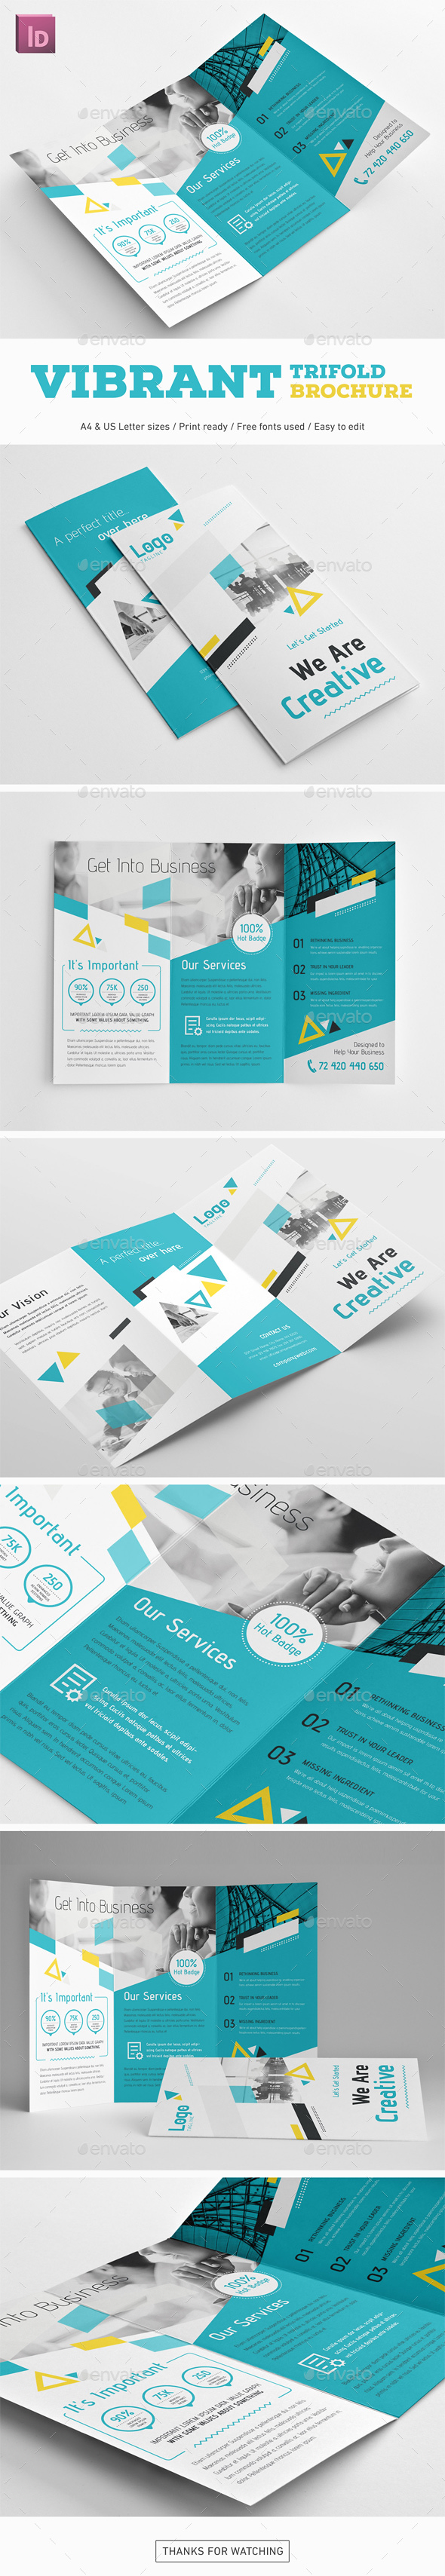 Vibrant Trifold Brochure - Corporate Brochures